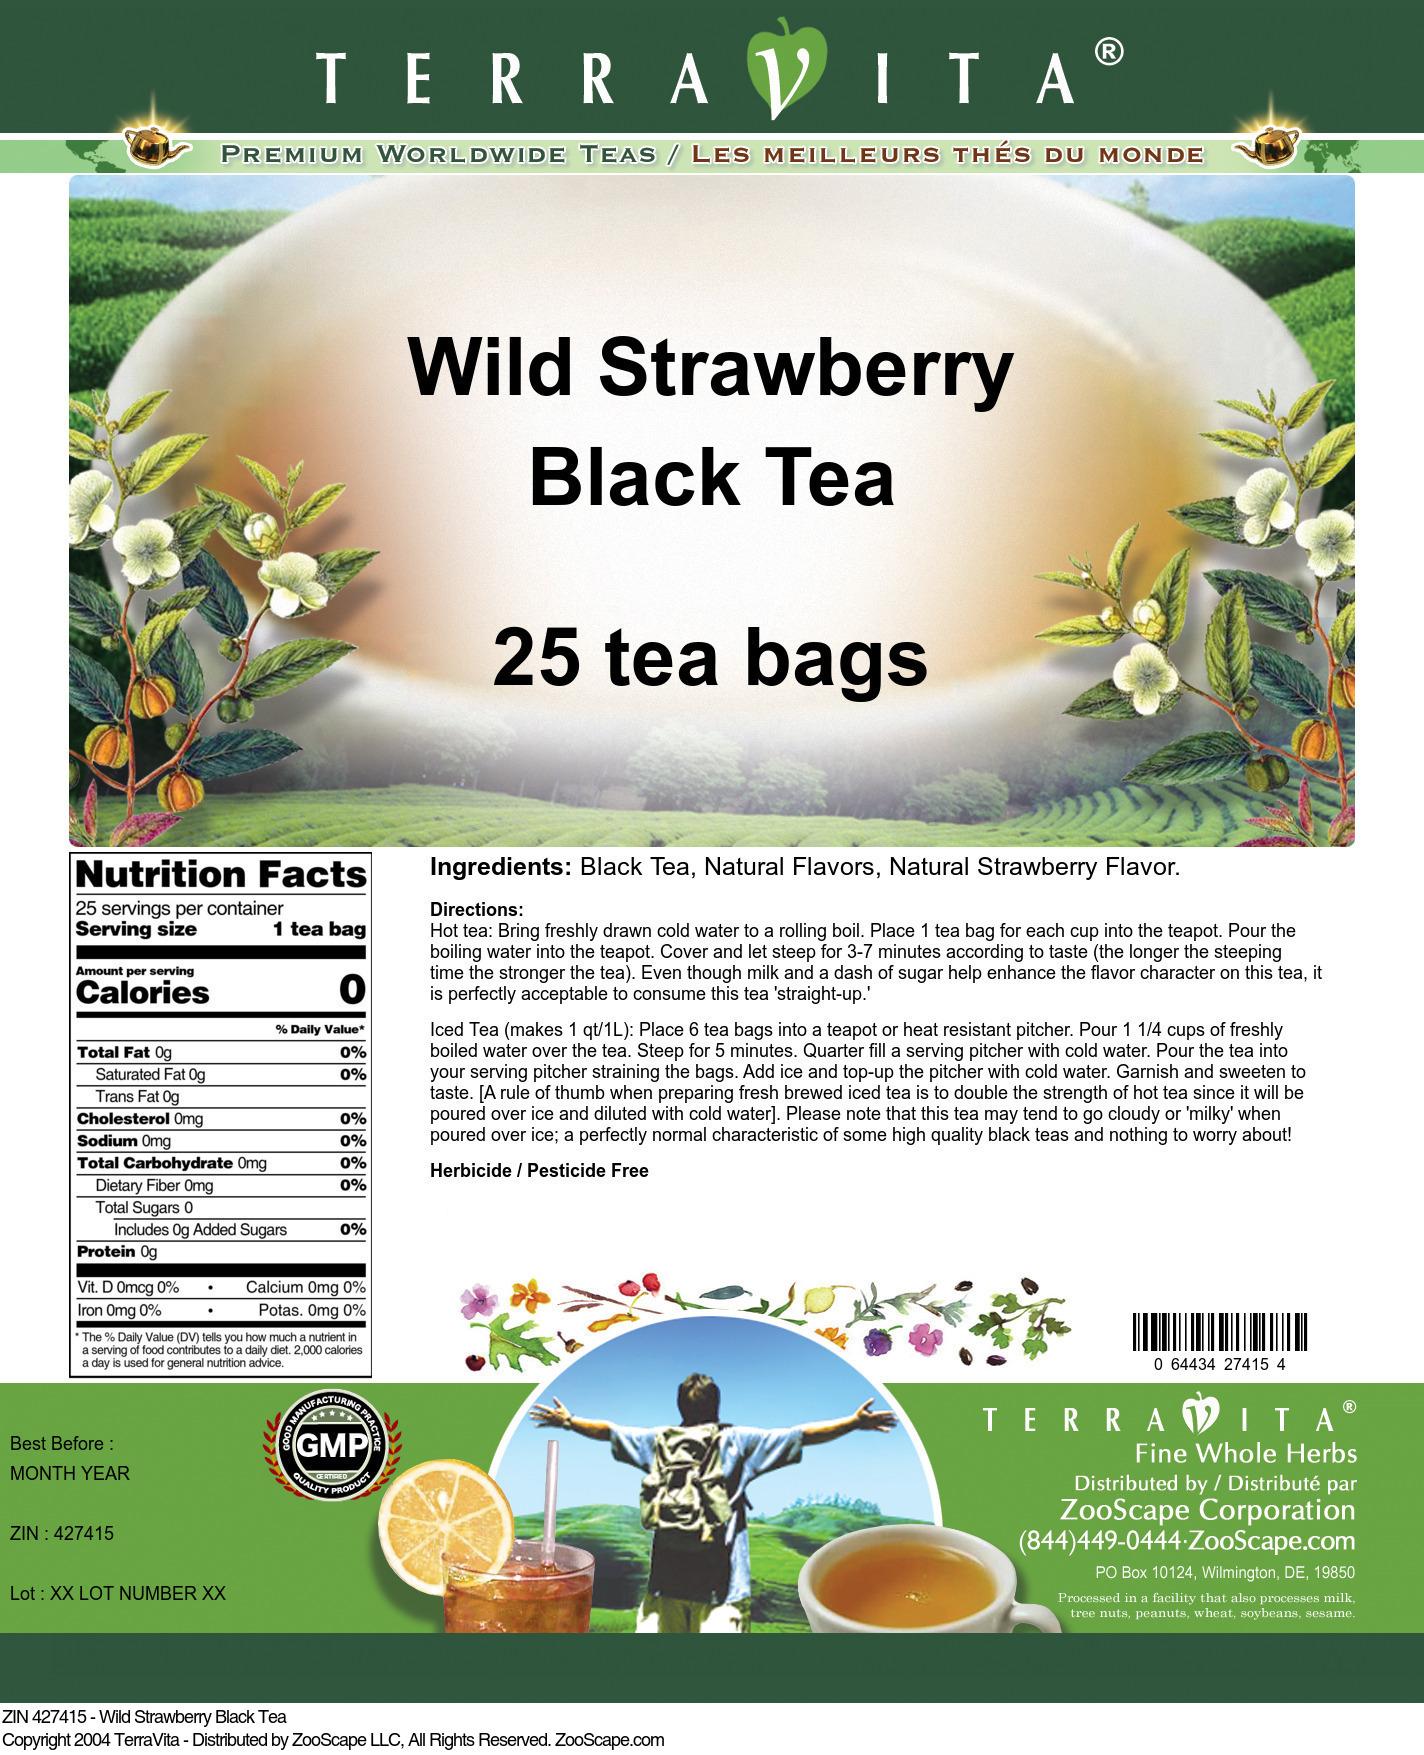 Wild Strawberry Black Tea